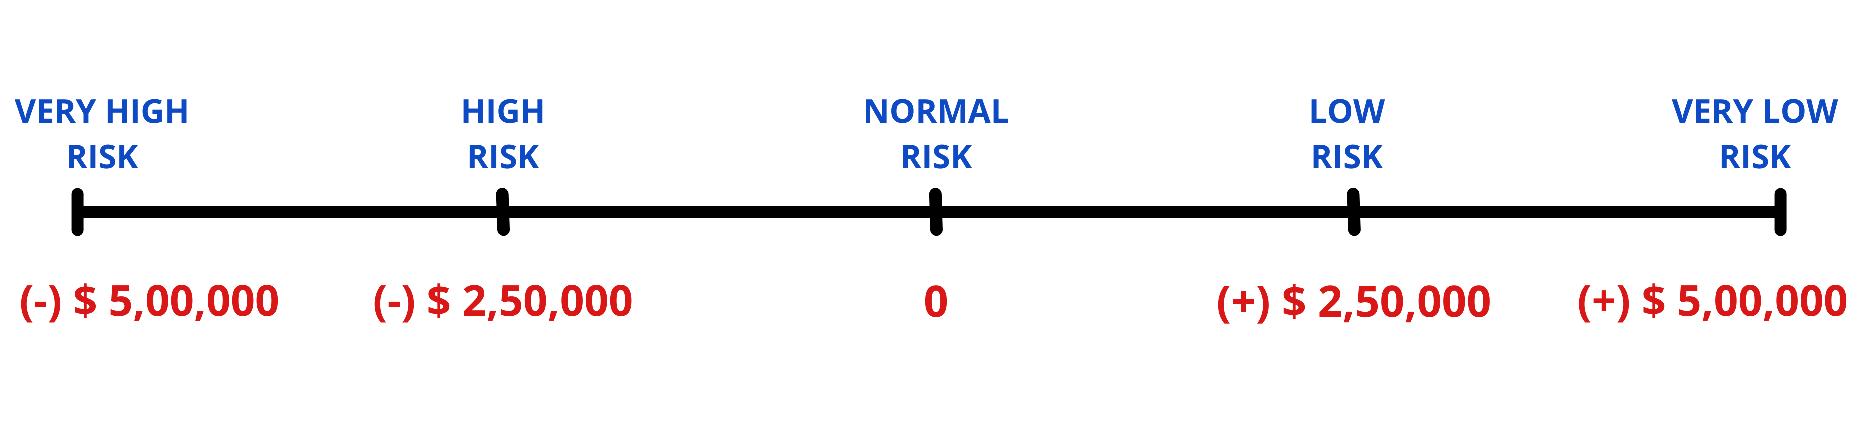 Risk factor Summation Method - Risk levels